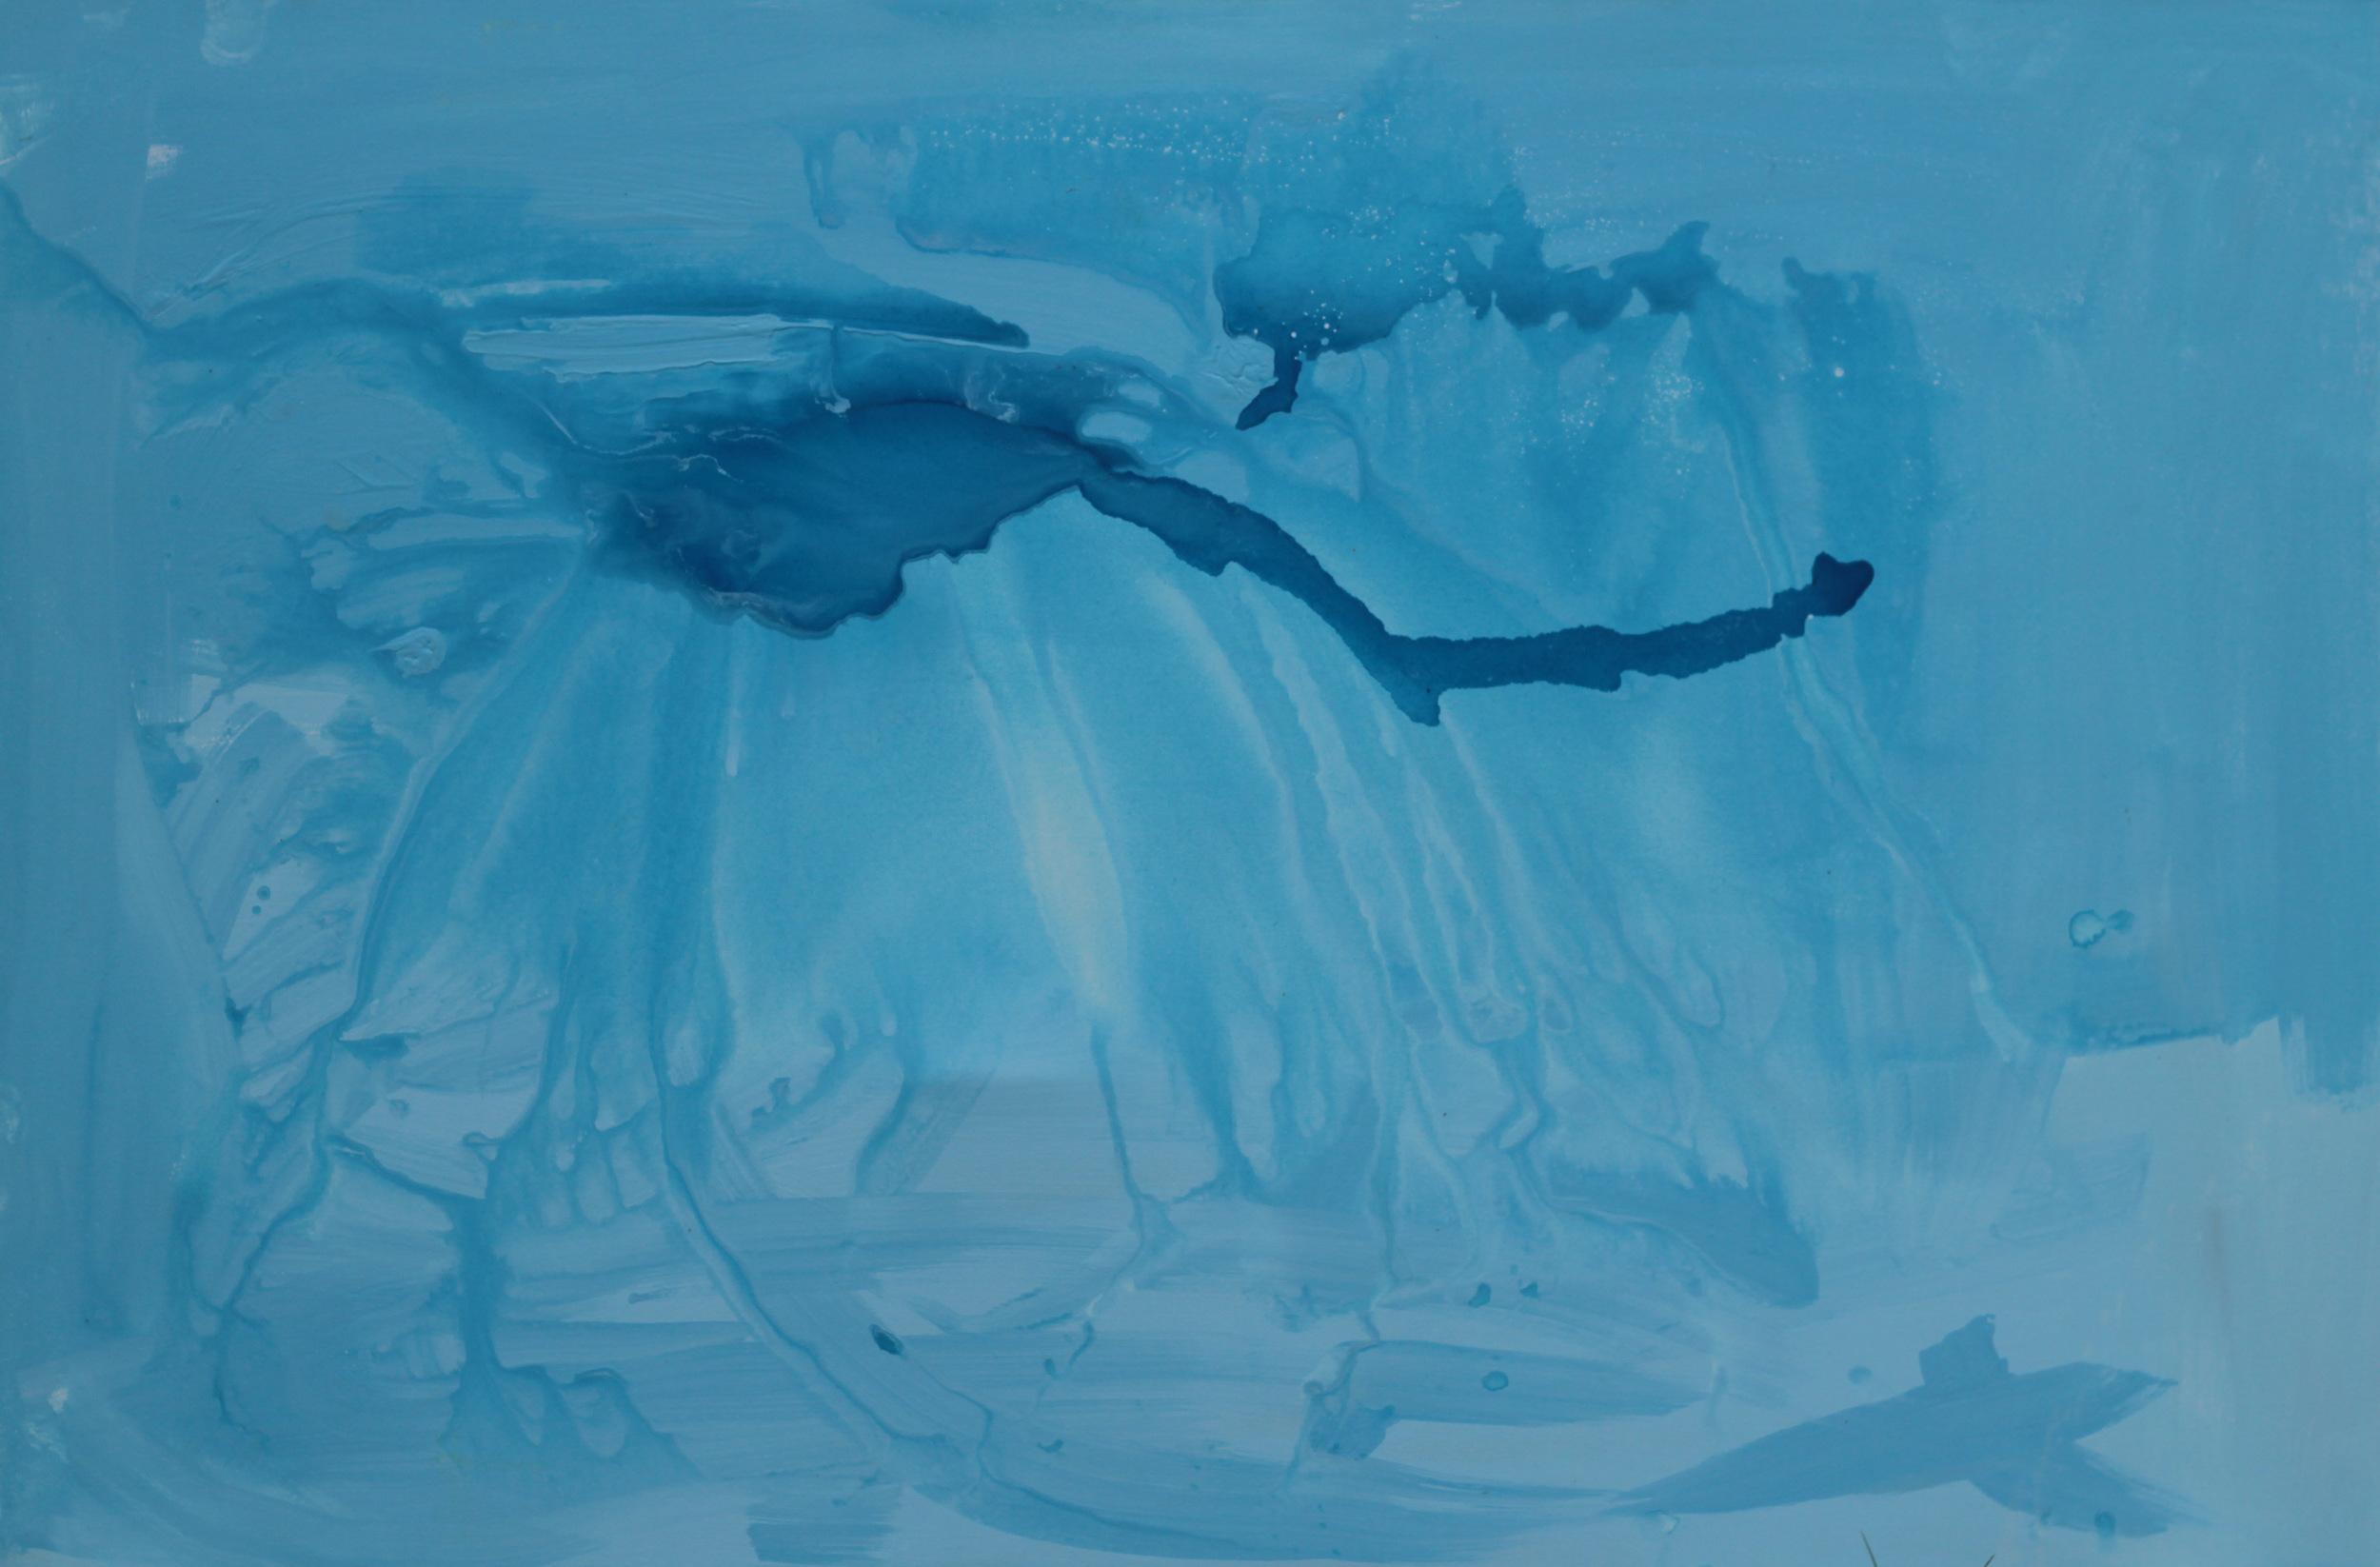 ICE CAP MELTING, ACRYLIC ON CANVAS, 152 X 120CM